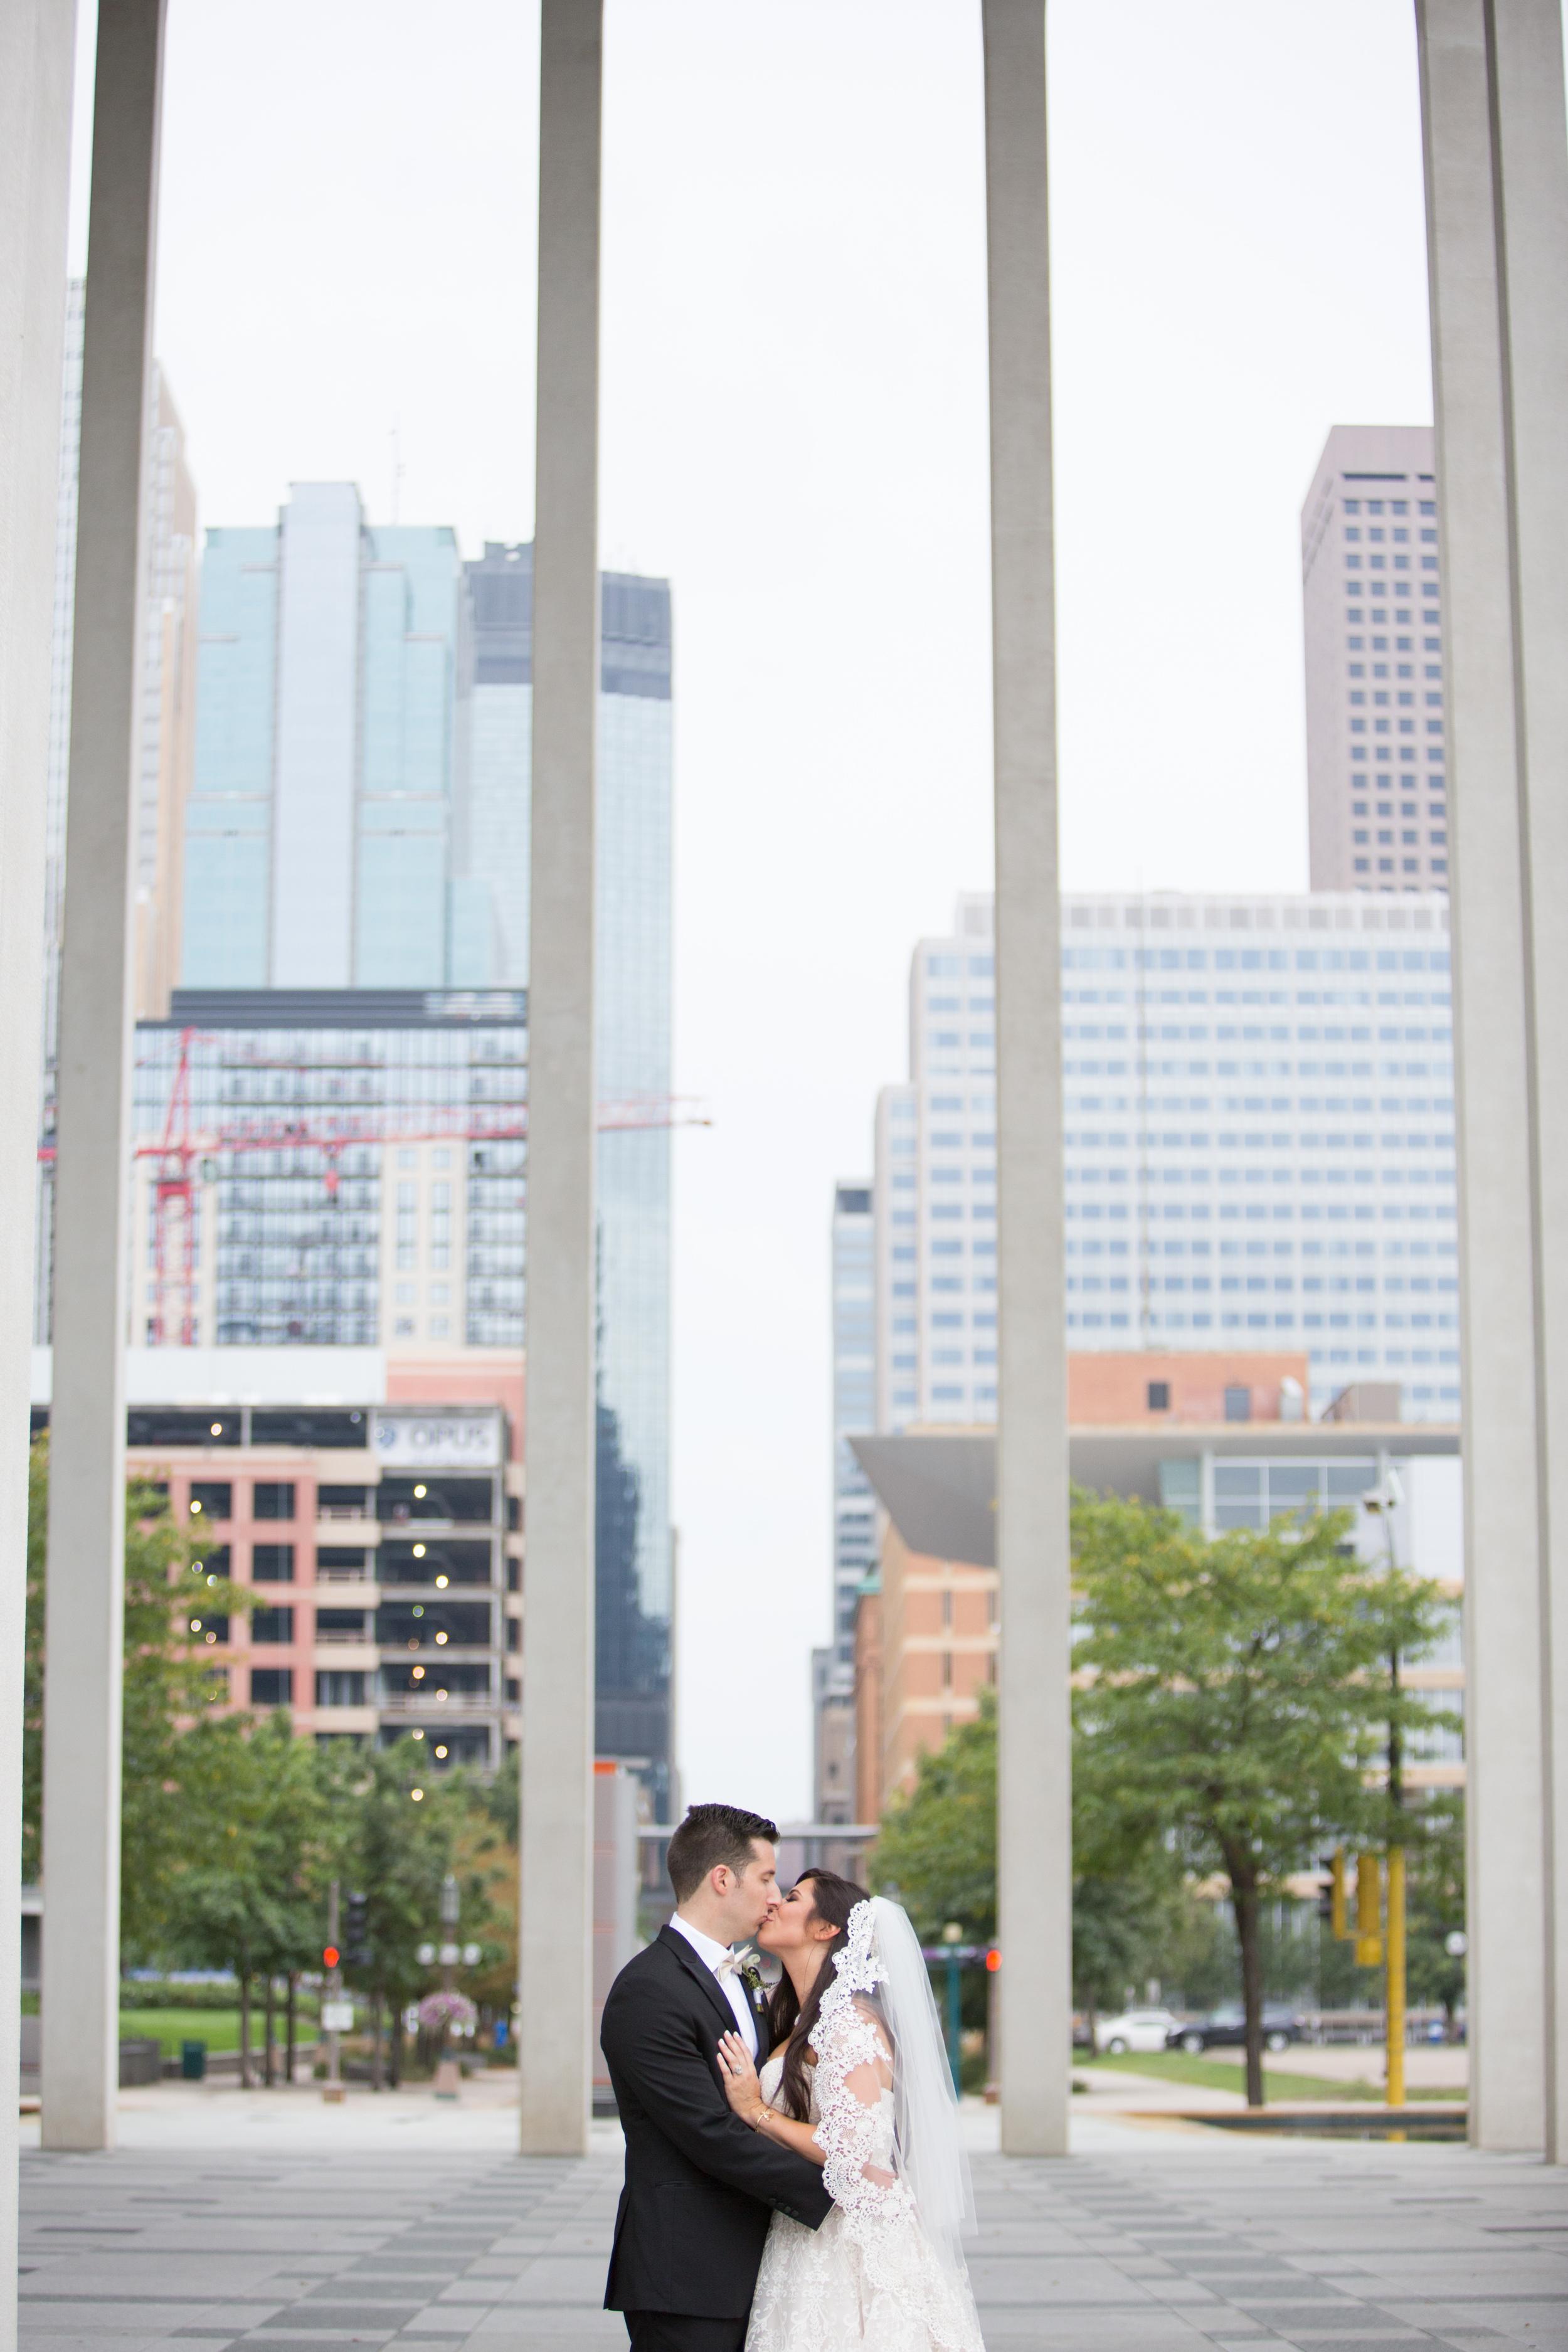 Acowsay_Cinema_MN_Wedding_Couple_4.jpg